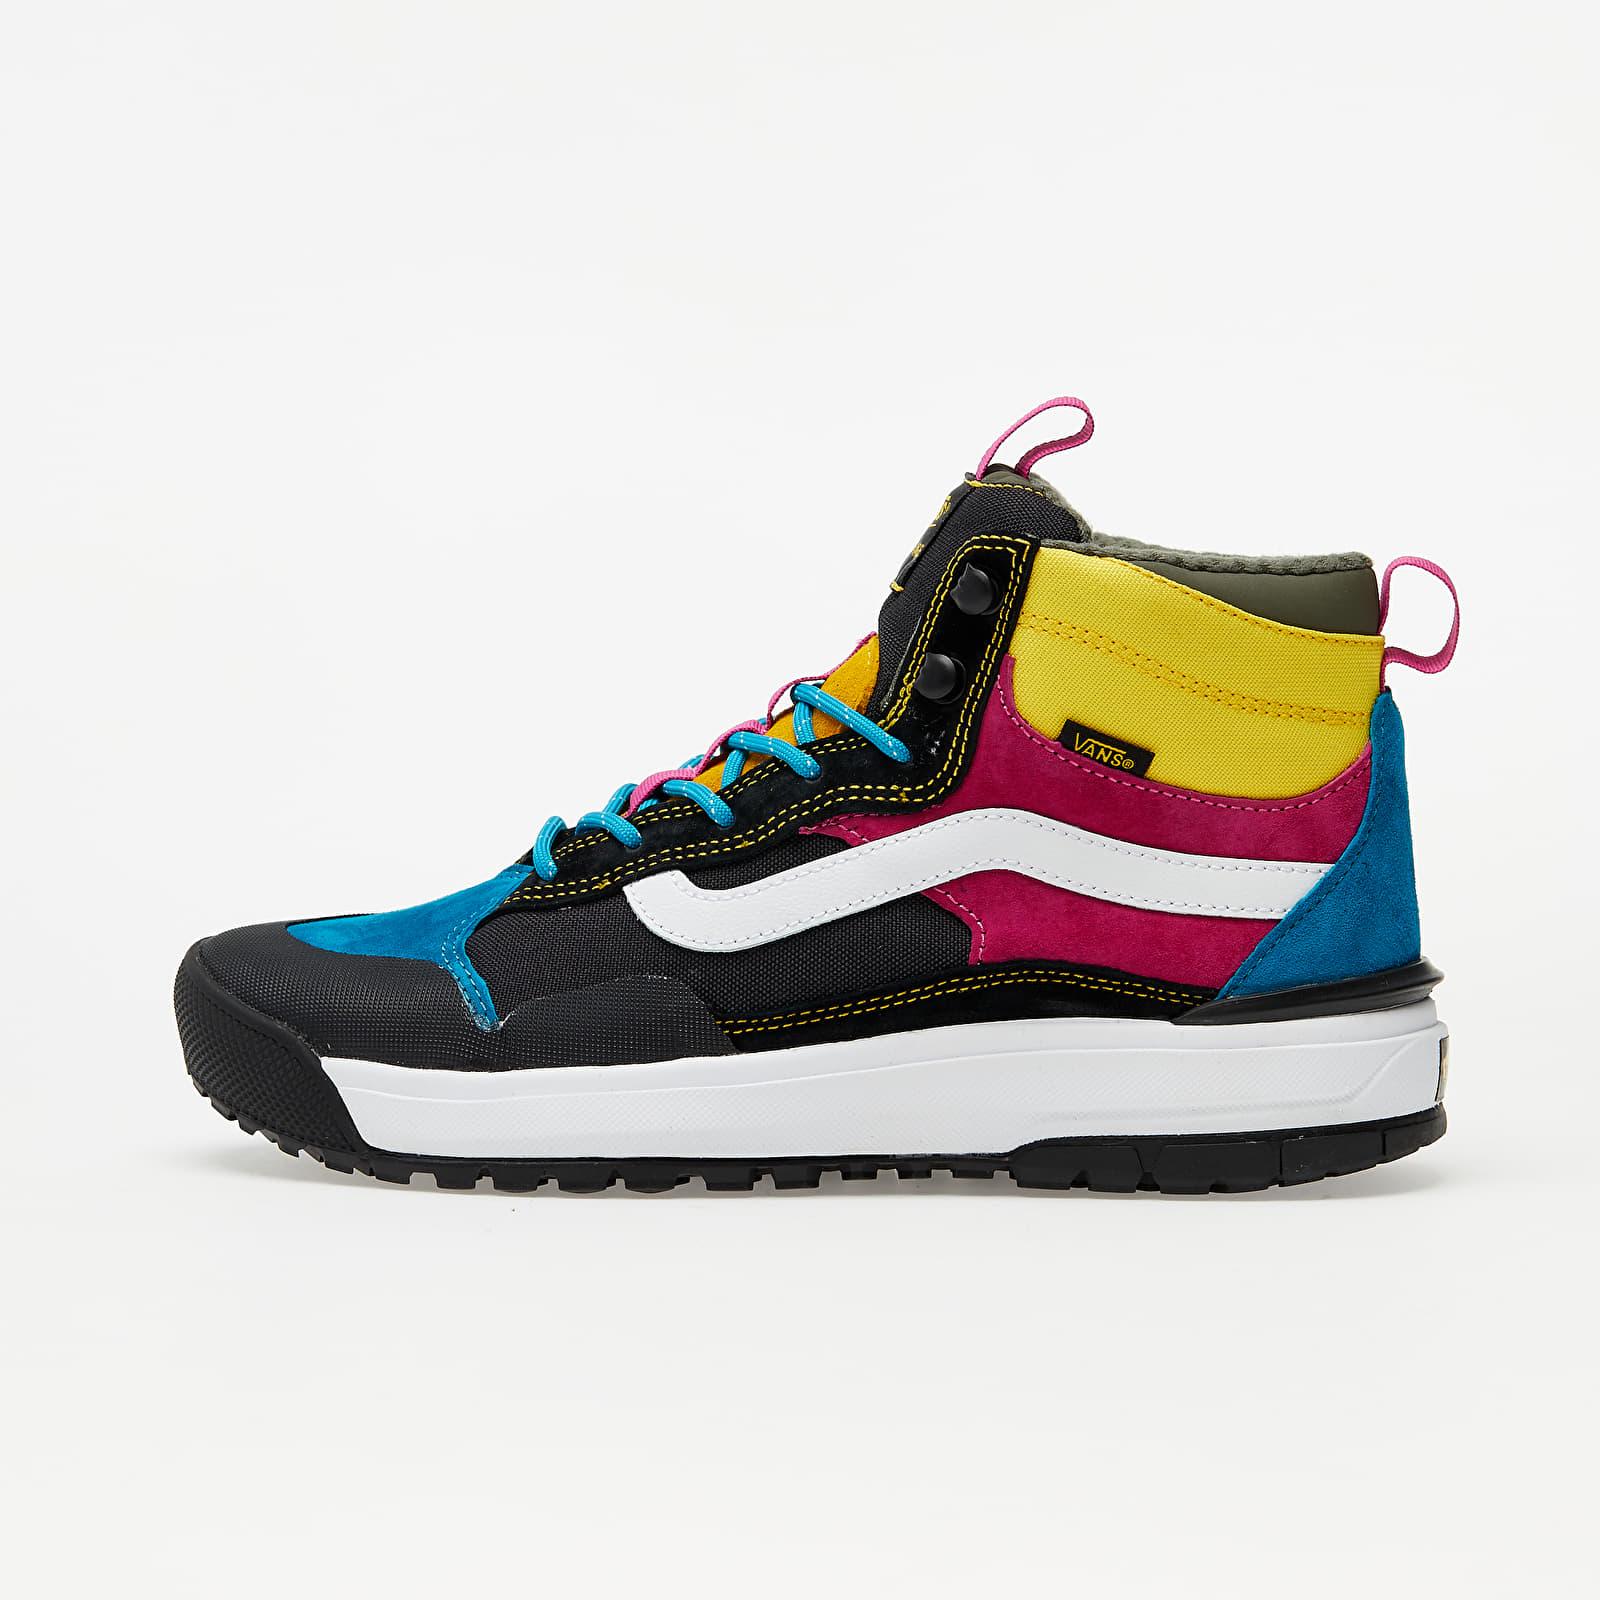 Scarpe e sneaker da uomo Vans Ultrarange Exo Hi MTE (MTE) 66 Supply/ Multi